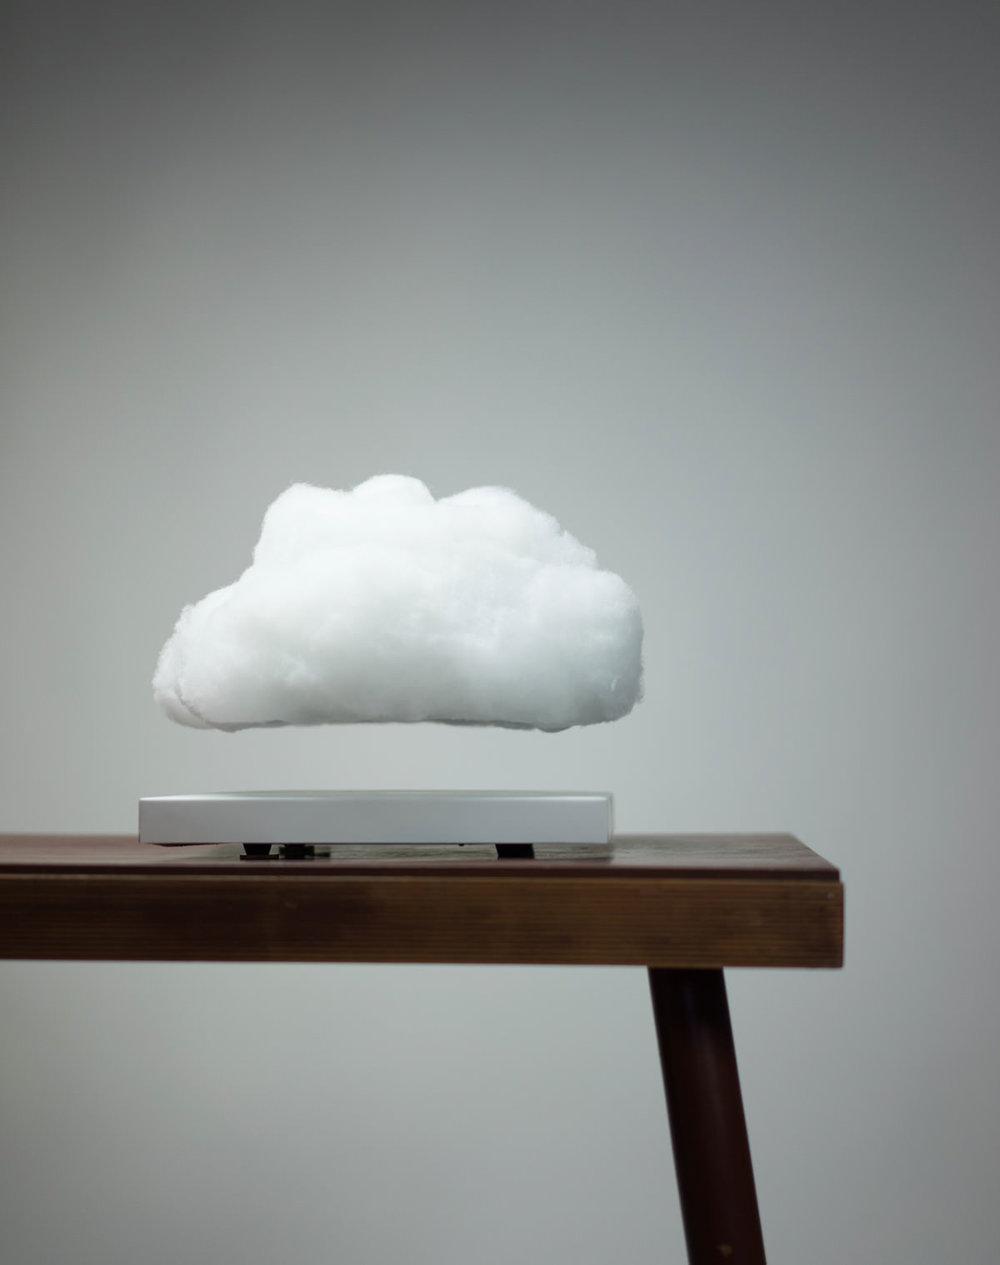 lampada-nuvola-volante-richard-clarckson